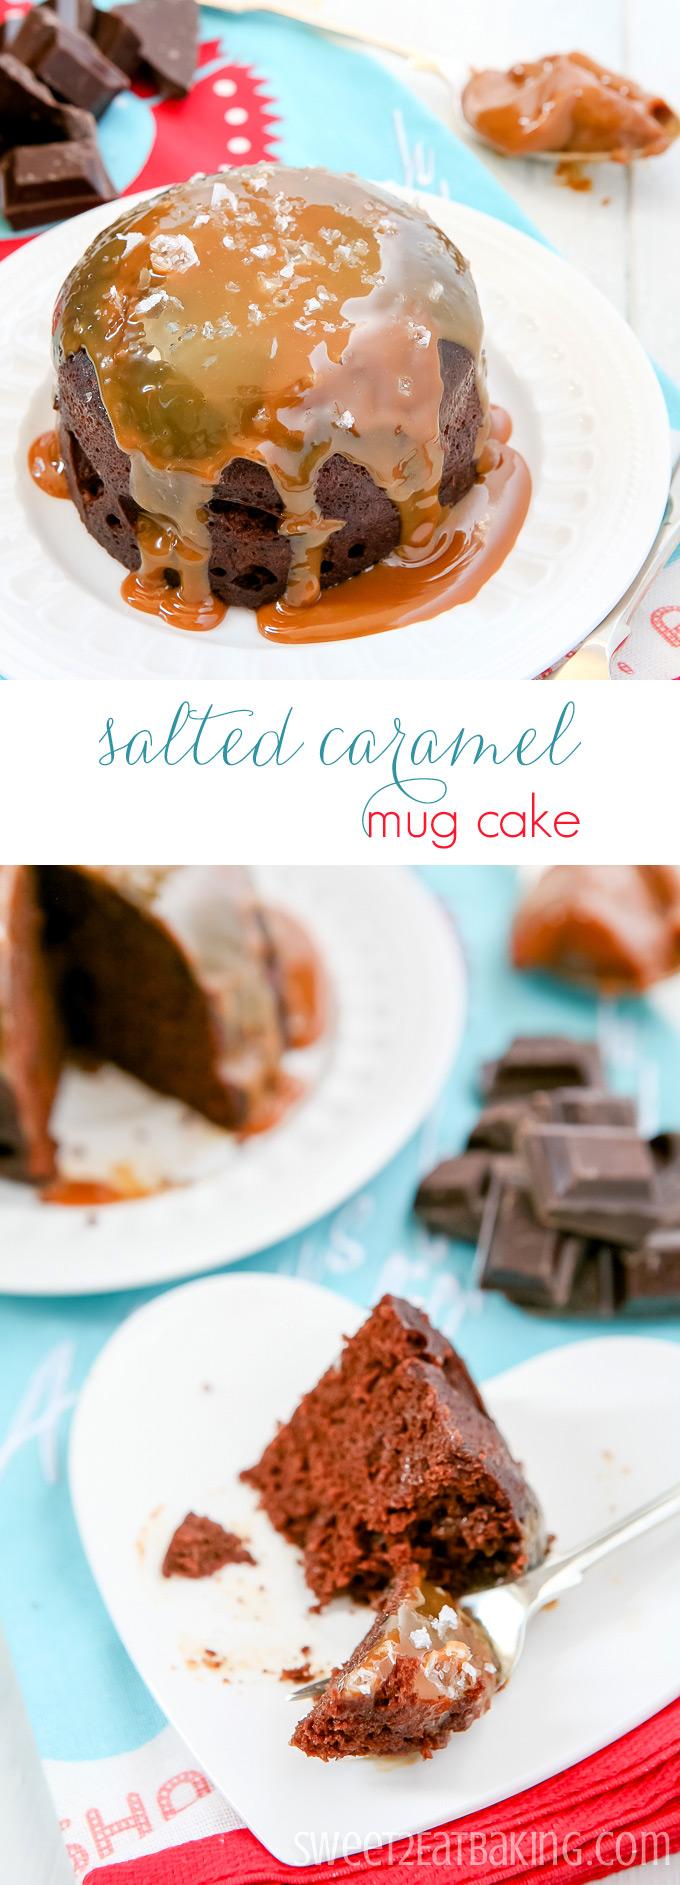 Chocolate Salted Caramel Mug Cake Recipe by Sweet2EatBaking.com